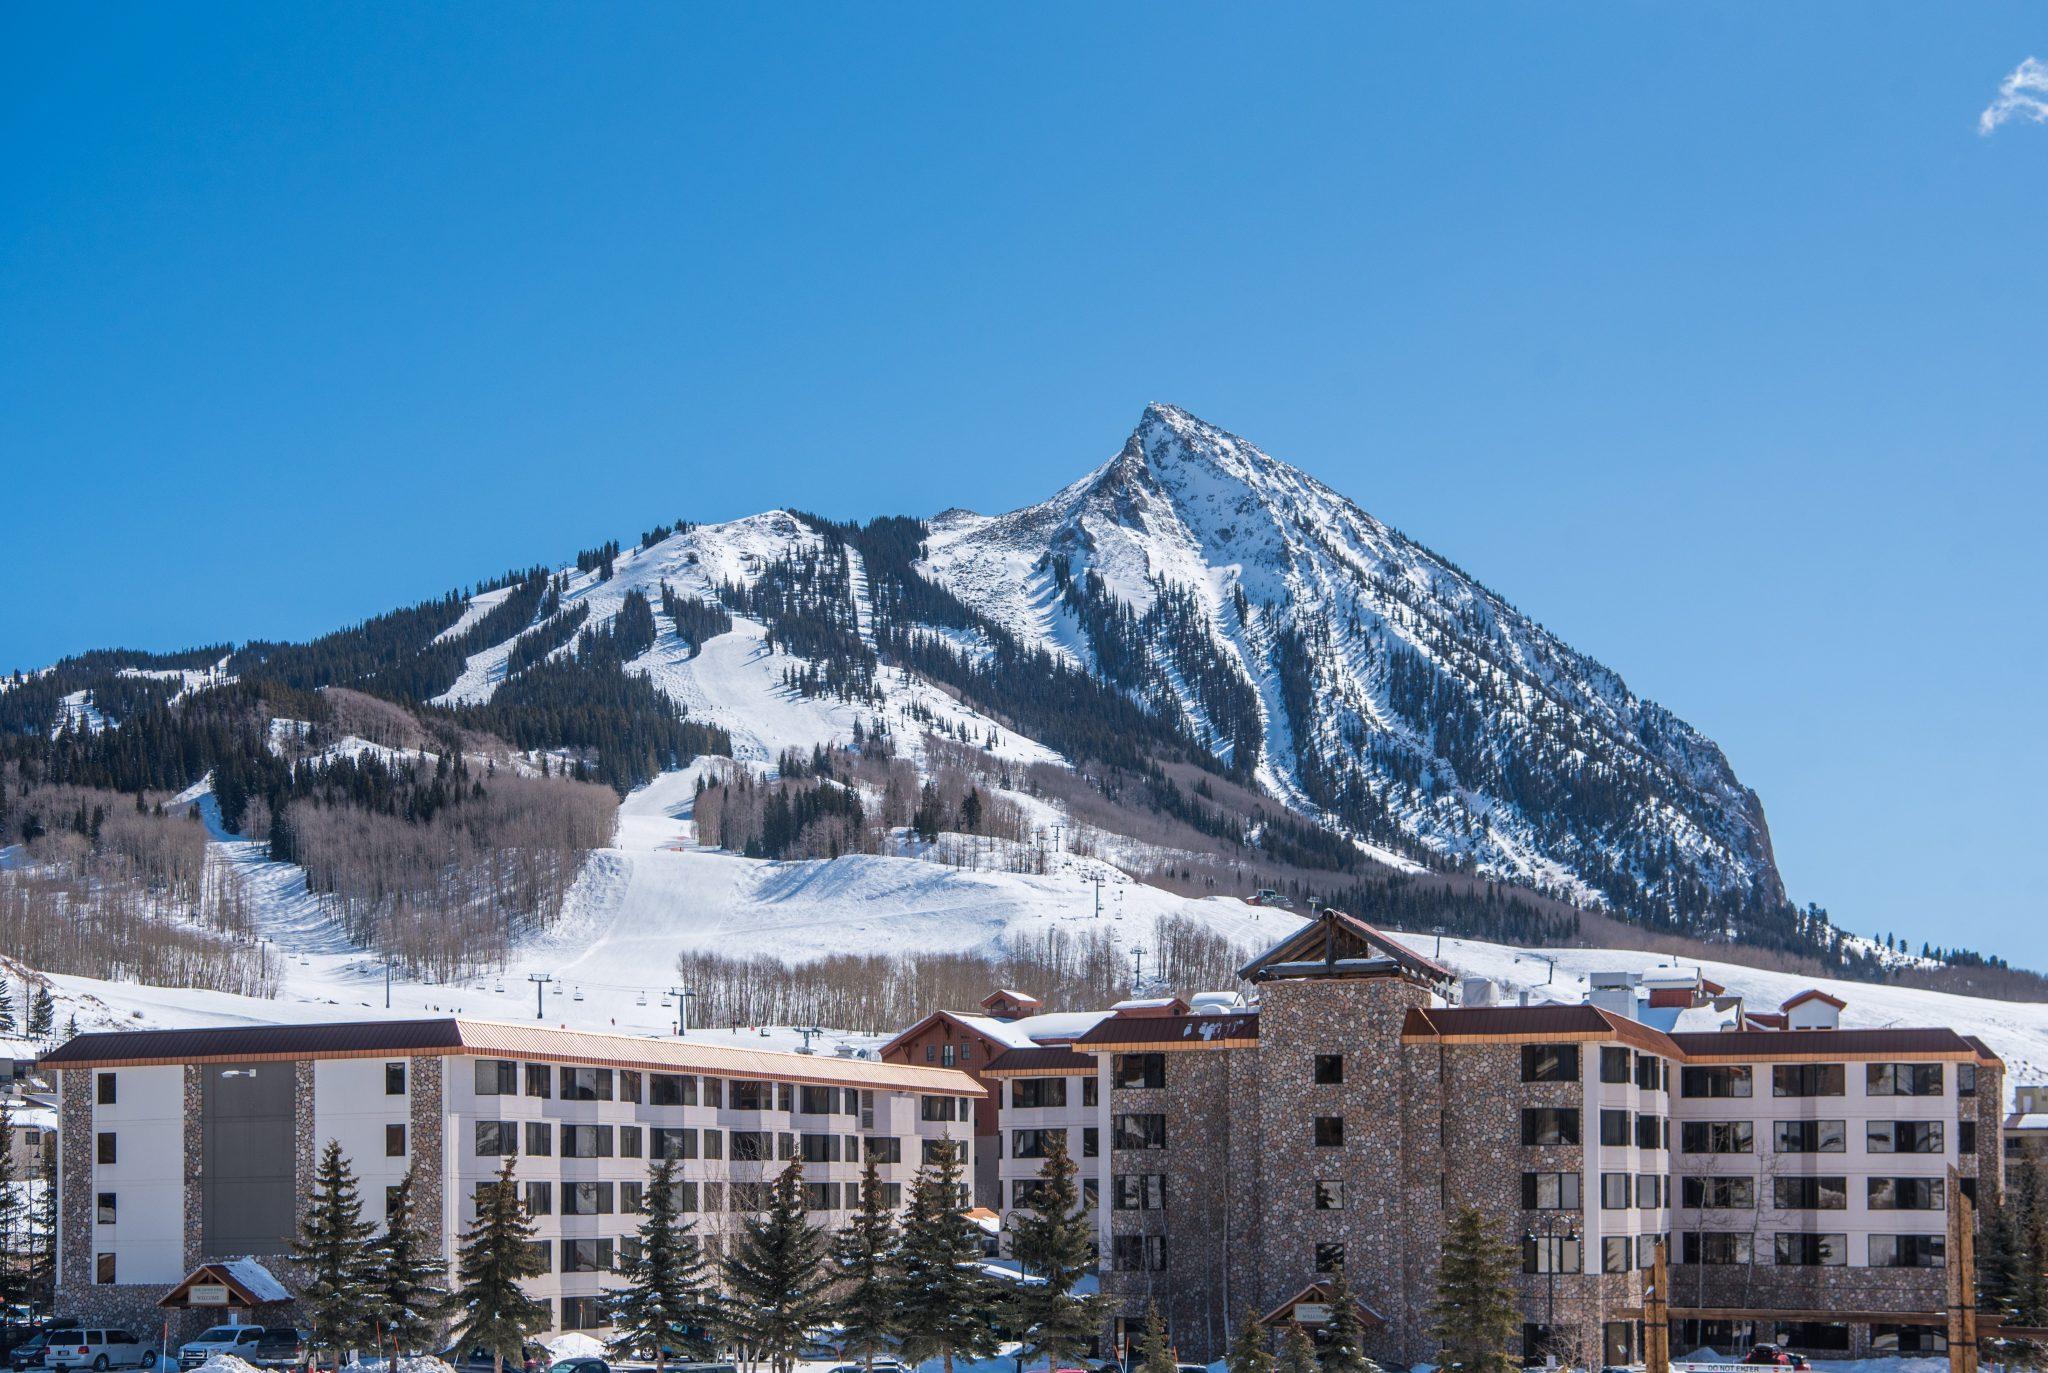 Grand Lodge Winter Exterior Peak